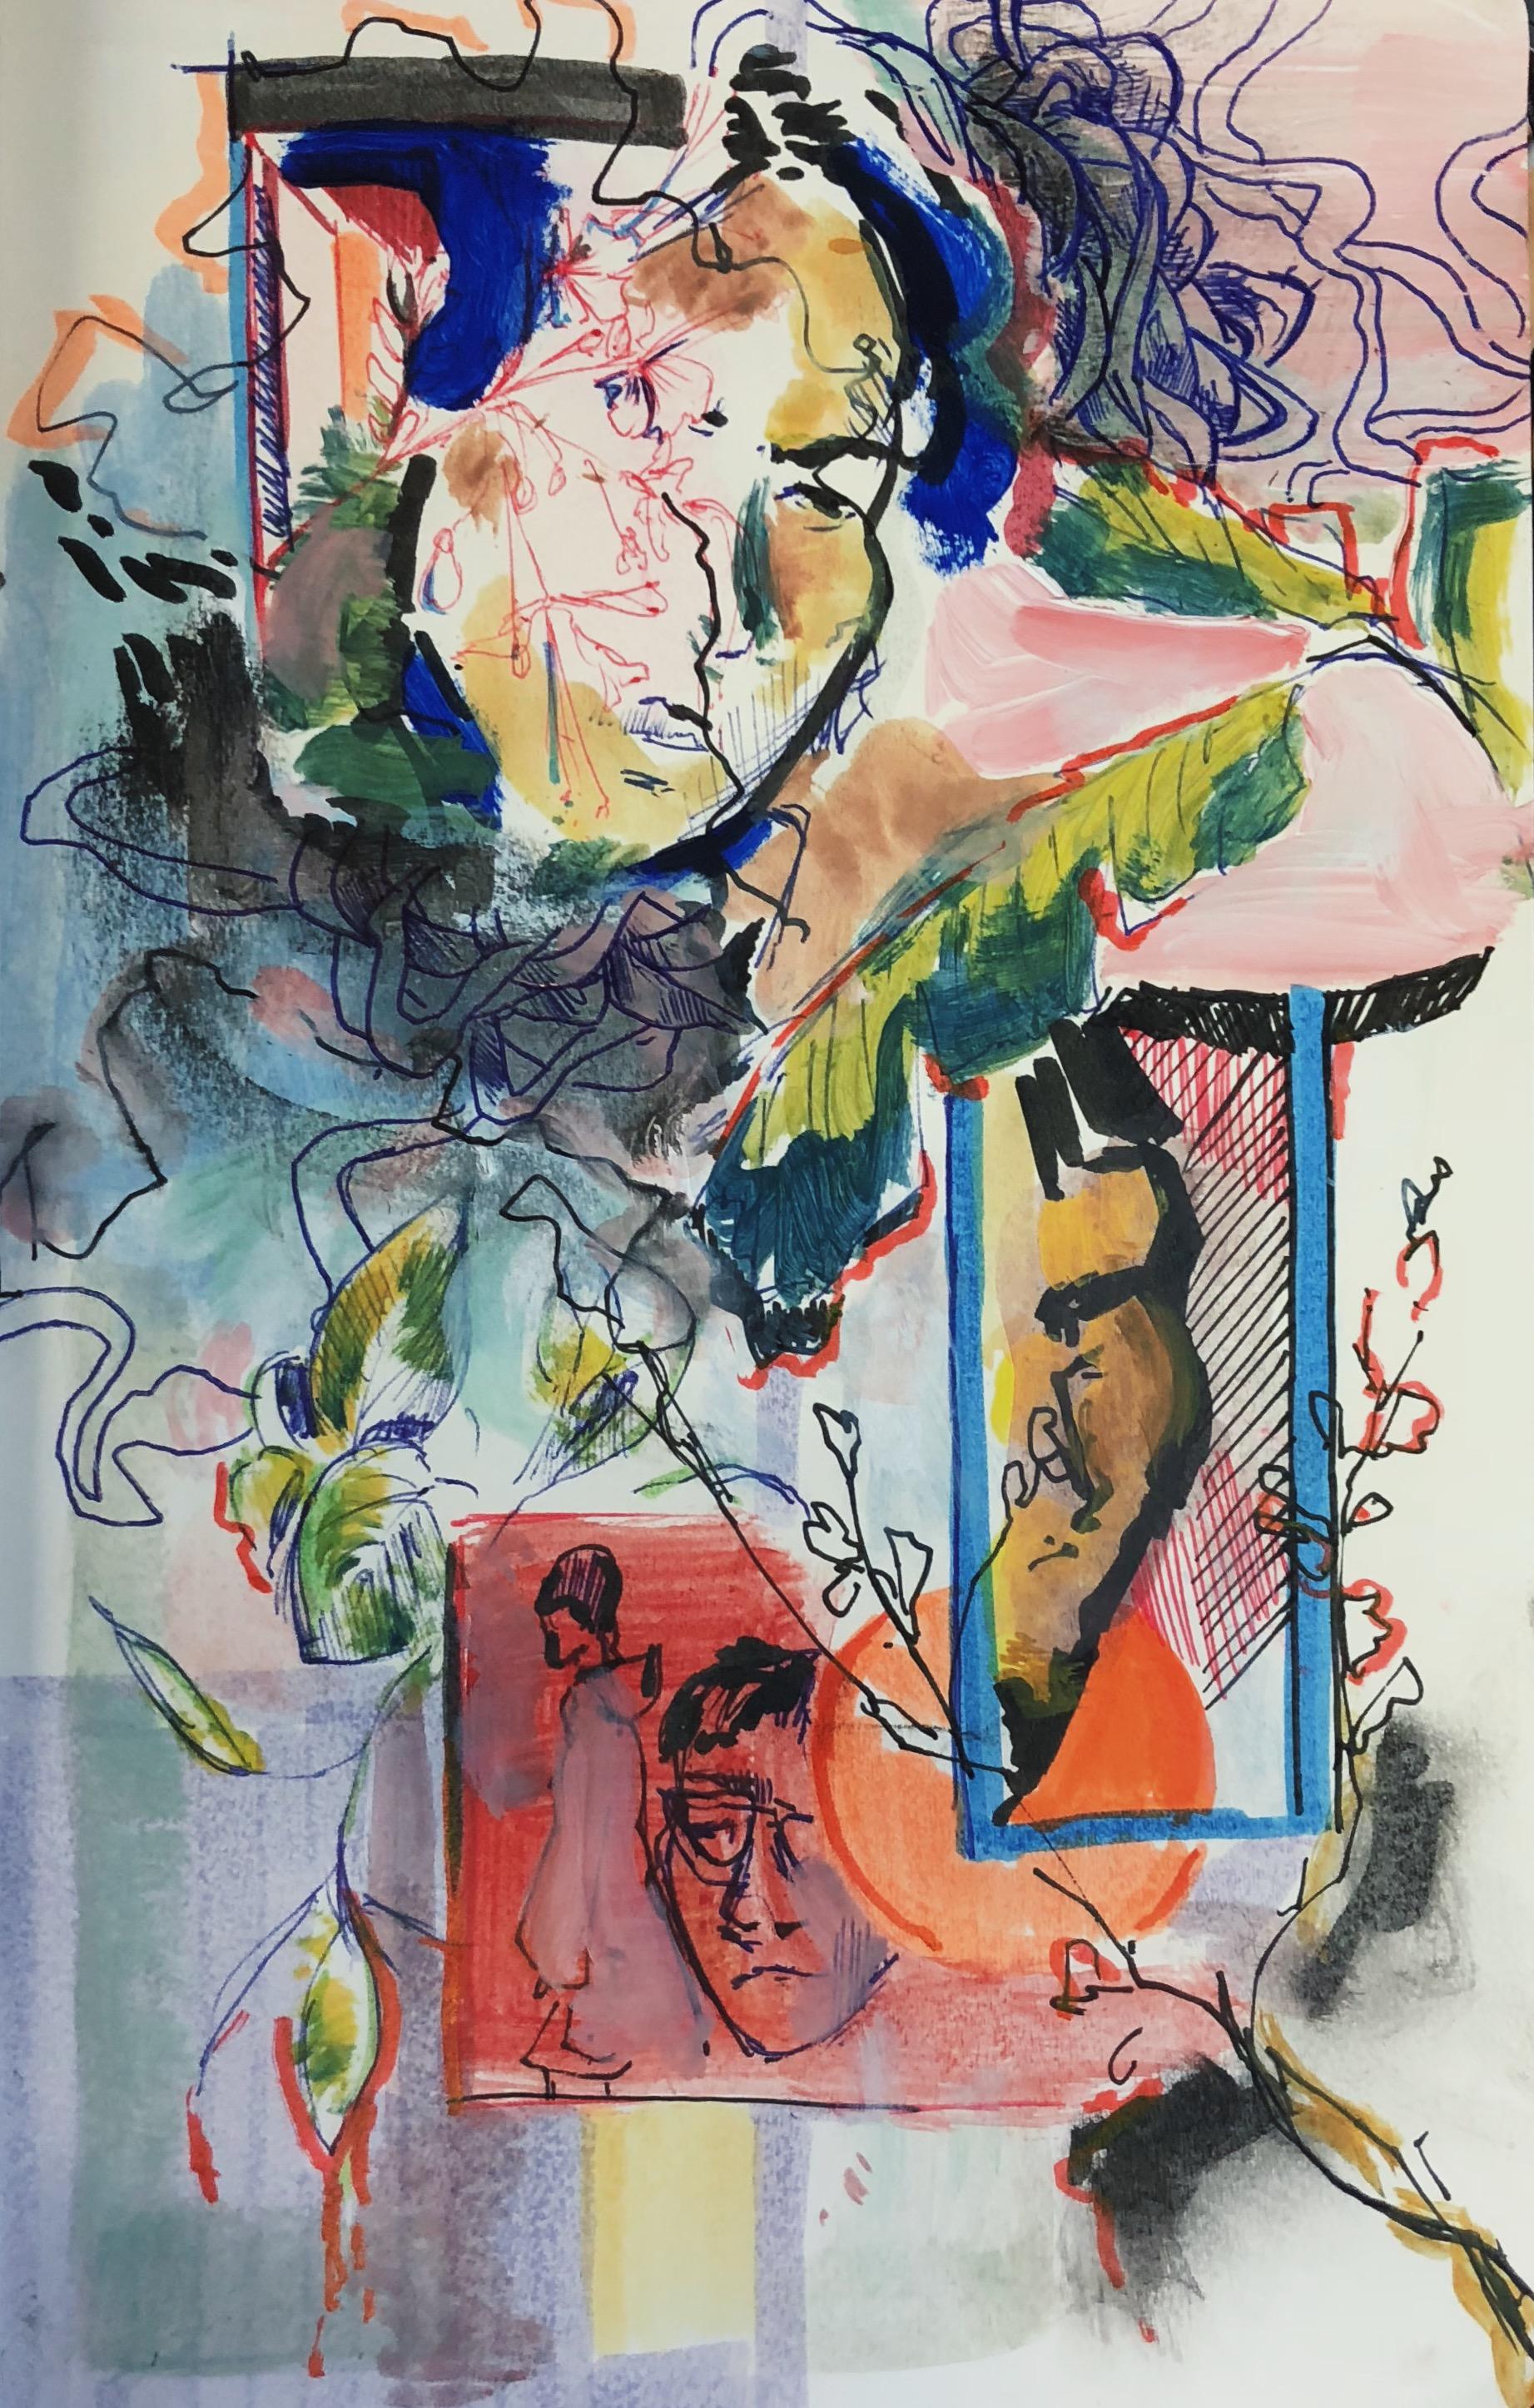 San Diego-based artist Esther Wang